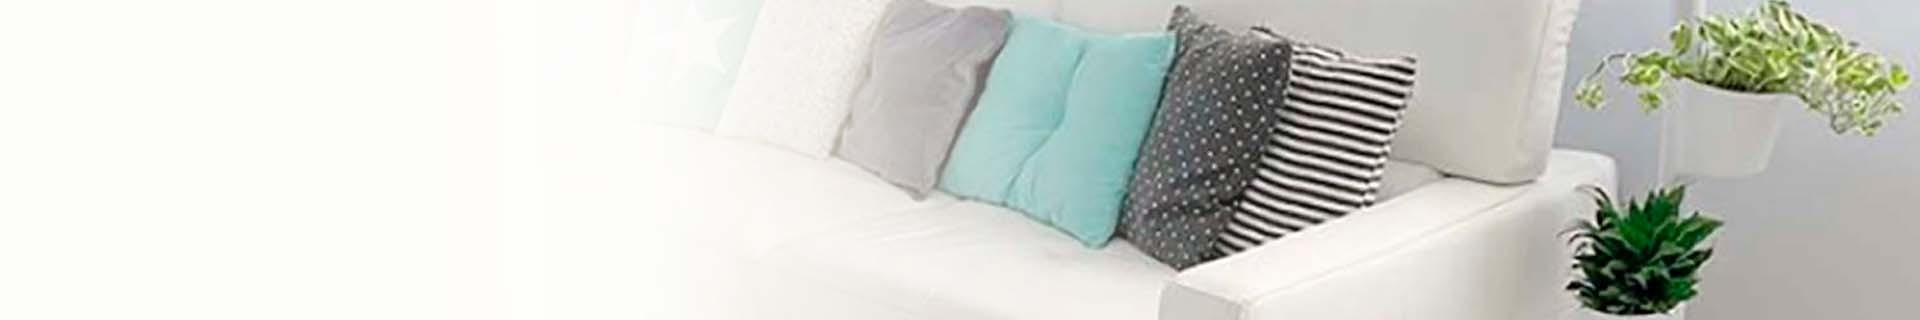 exklusive Edition vertiakler Blumentopf | CitySens